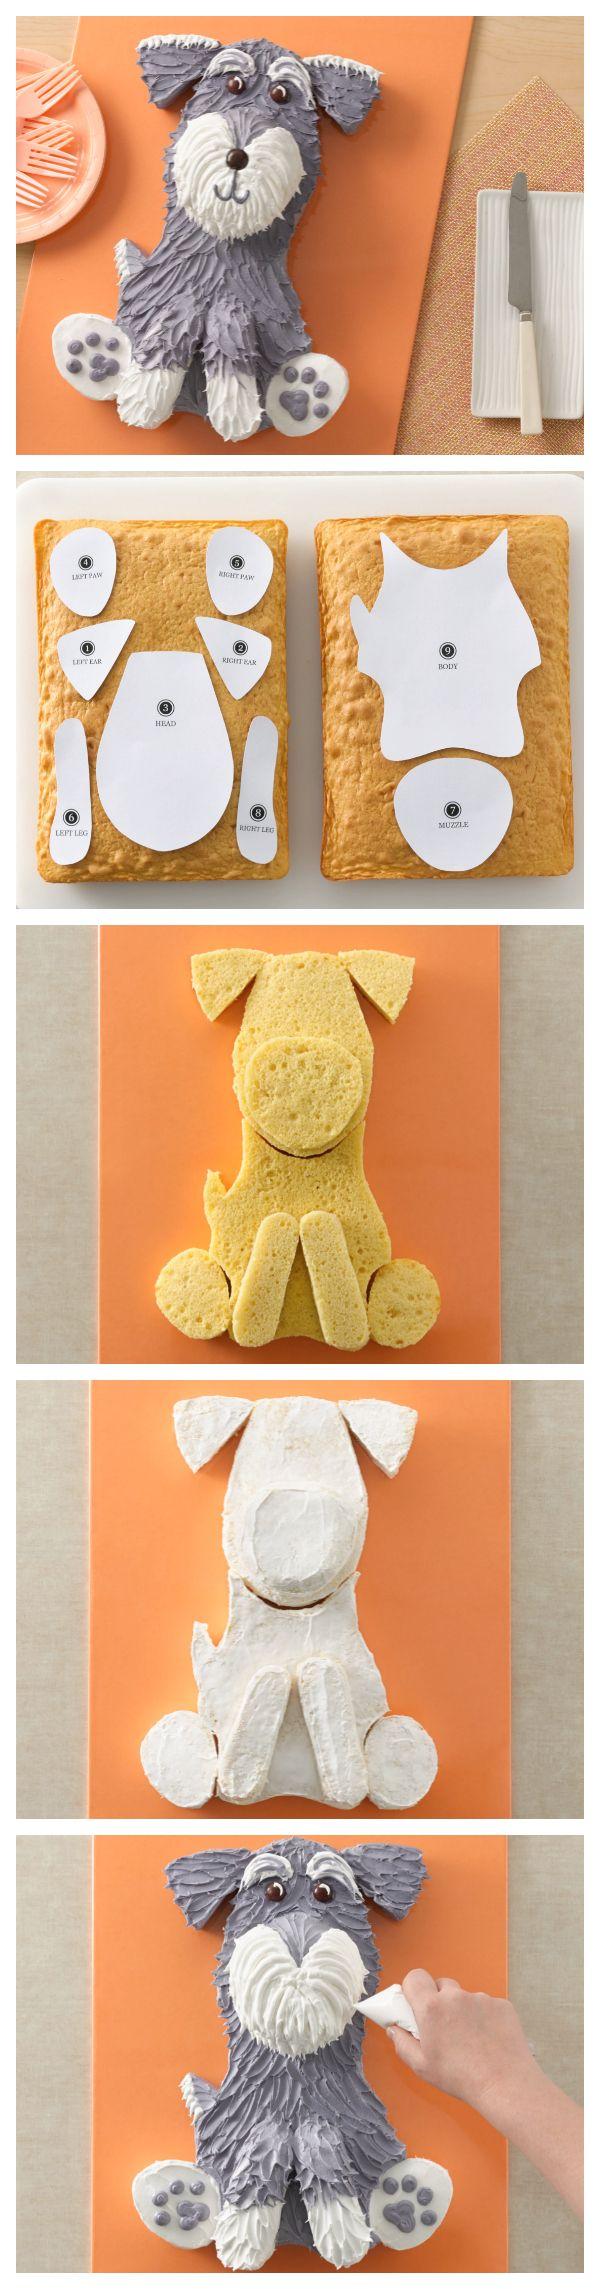 Schnauzer Dog Cake   Recipe   Cakes   Pinterest   Schnauzer dogs ...